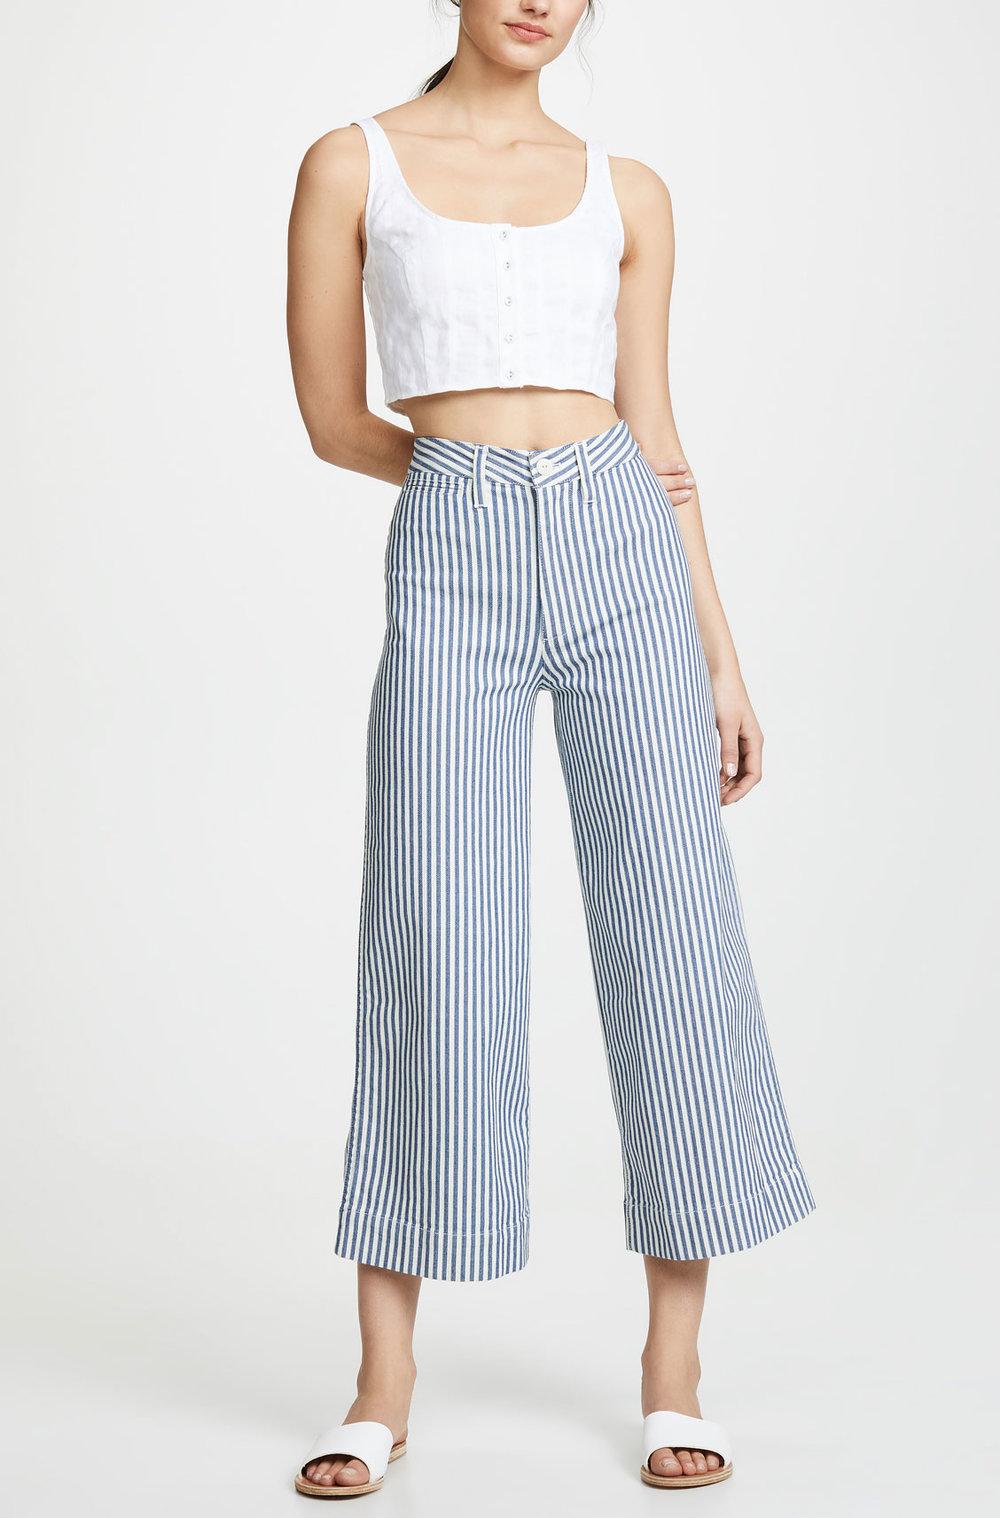 Madewell Strip Pants     $95